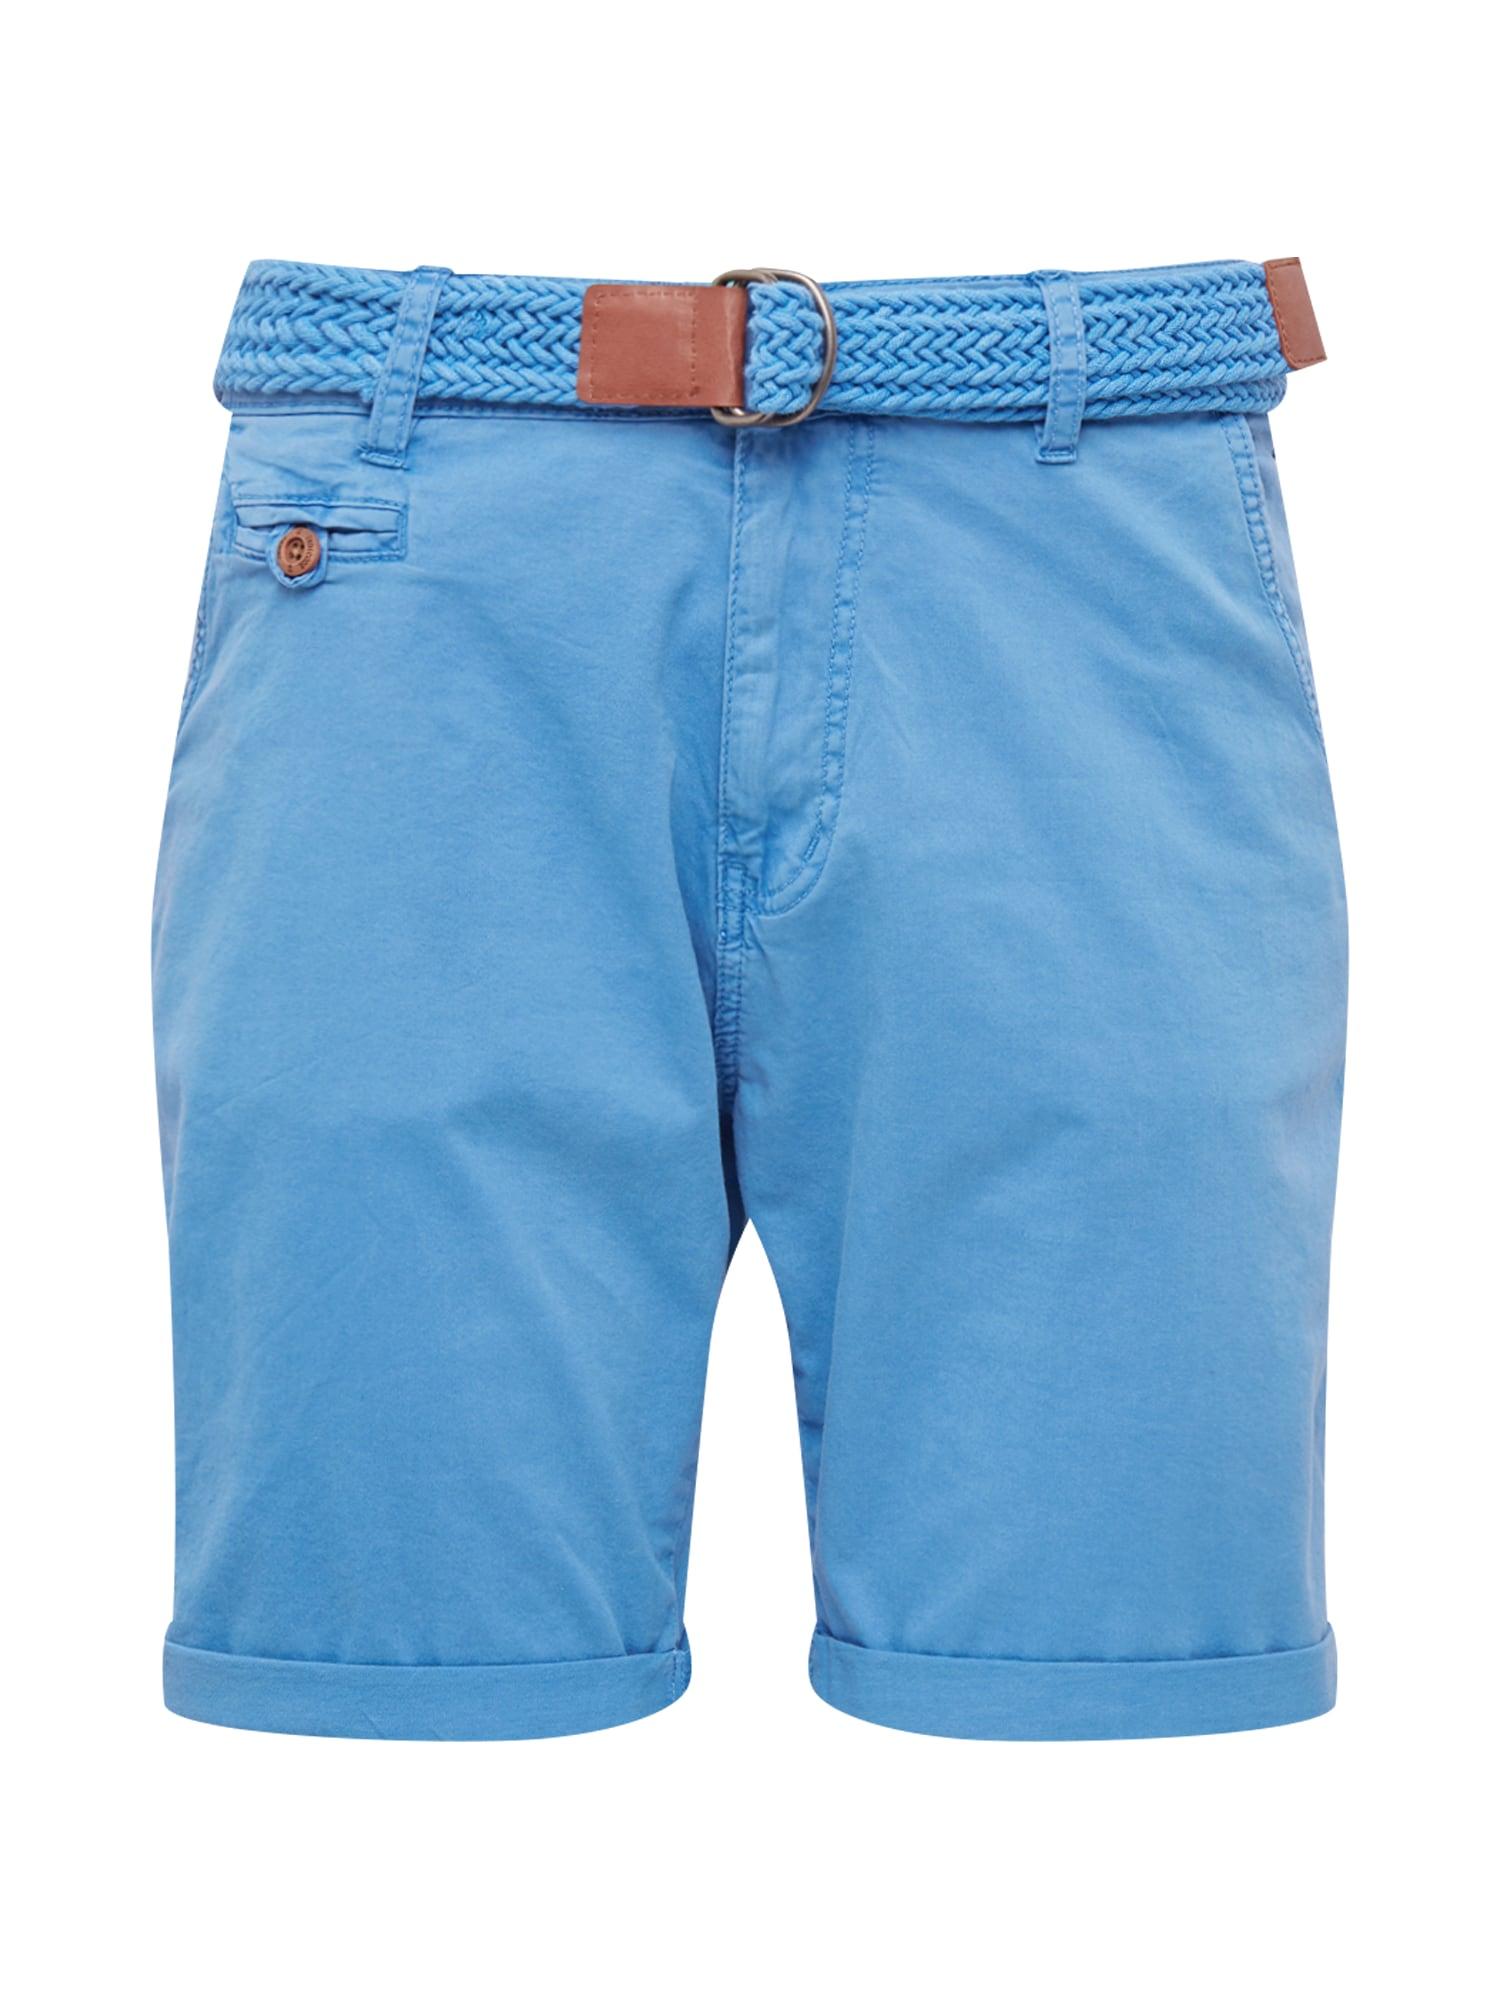 Chino kalhoty Conor blau INDICODE JEANS